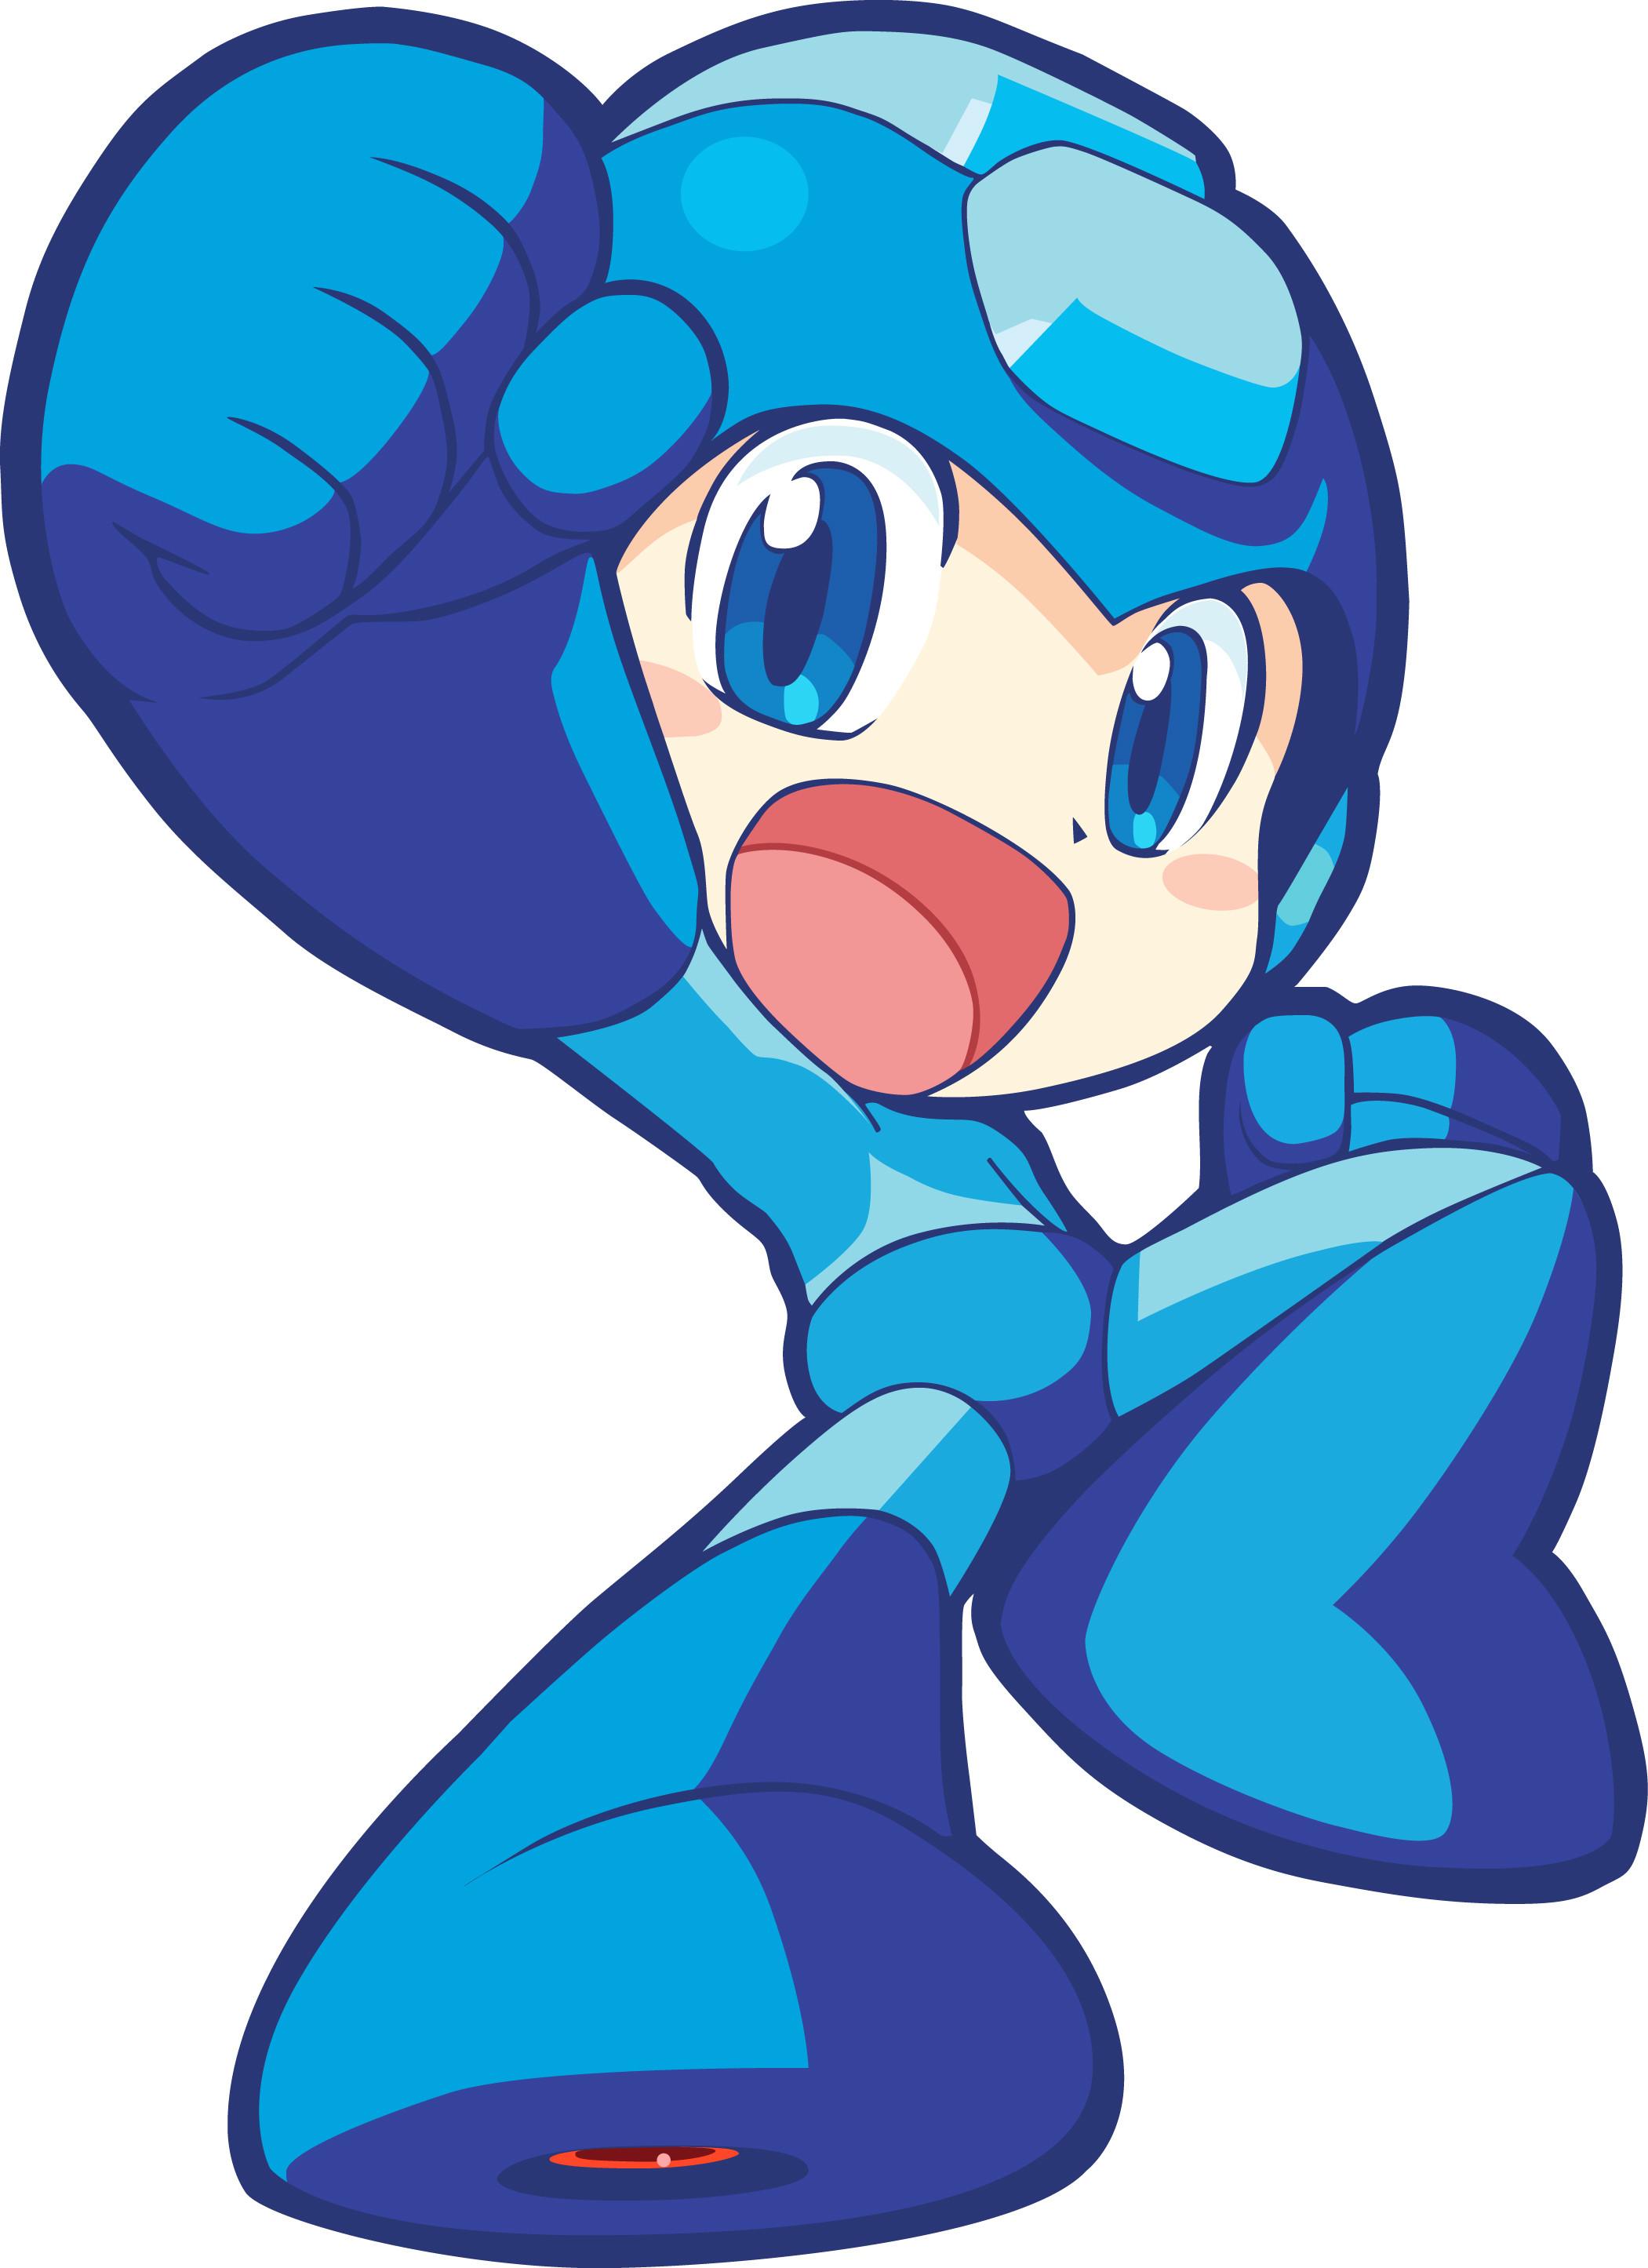 Megaman (Megaman Powered Up)